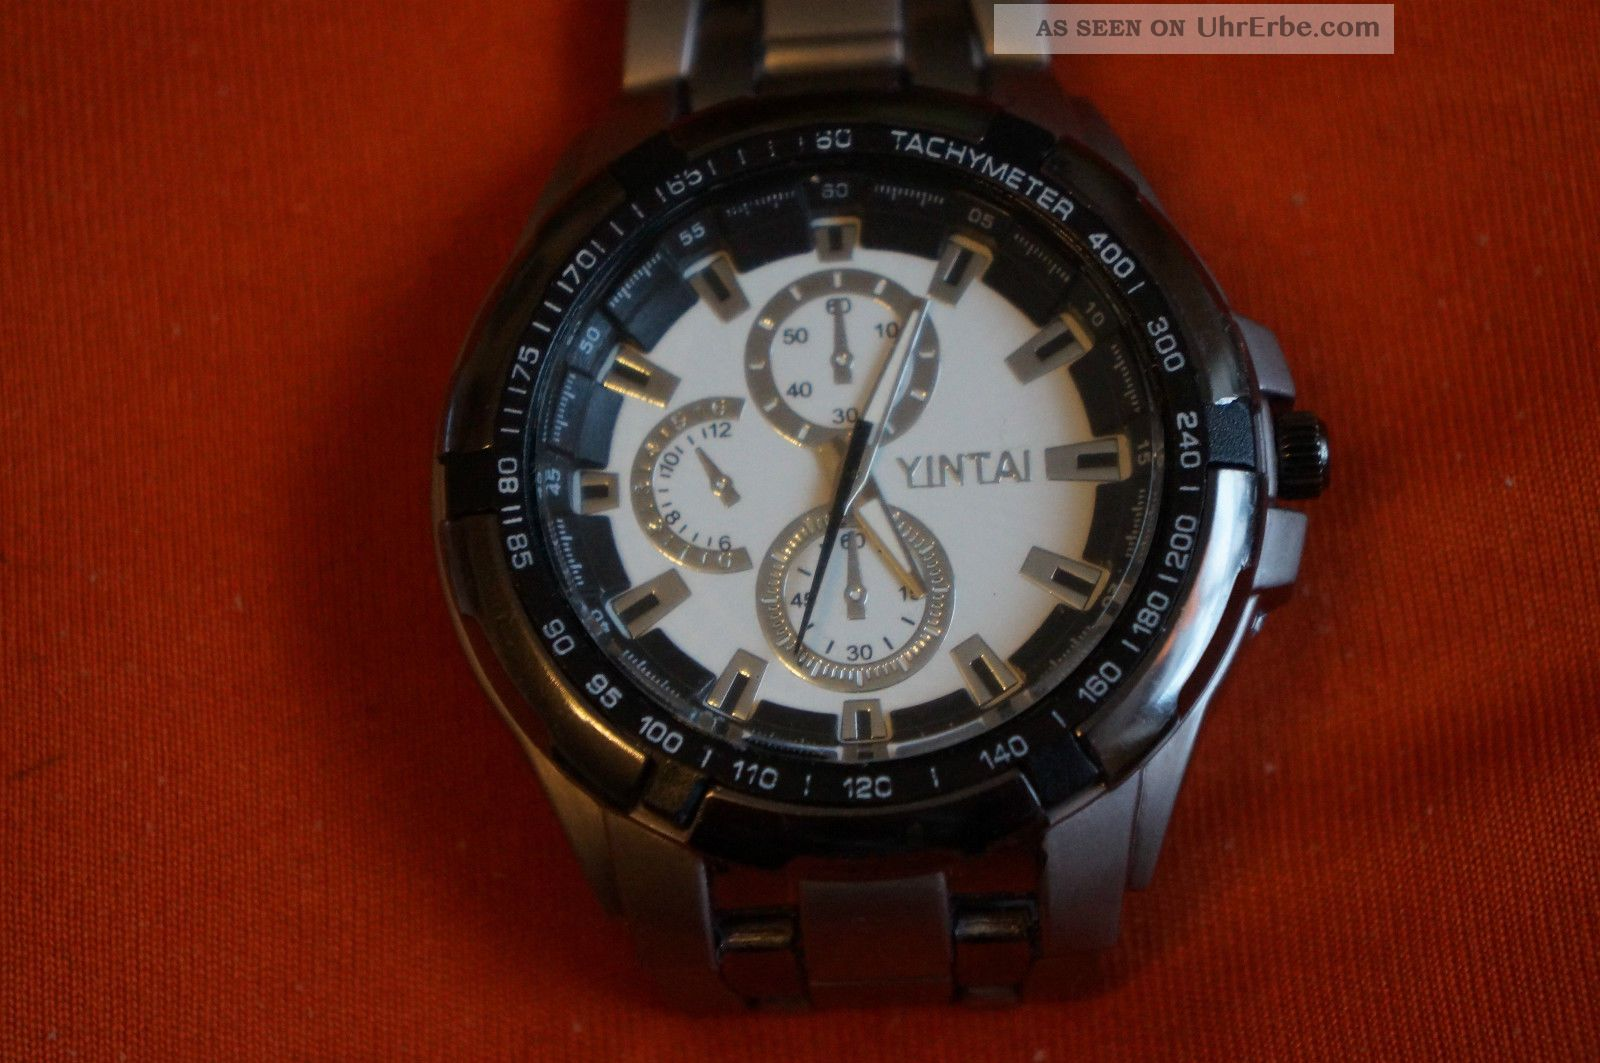 Armbanduhr Yintai Armbanduhren Bild